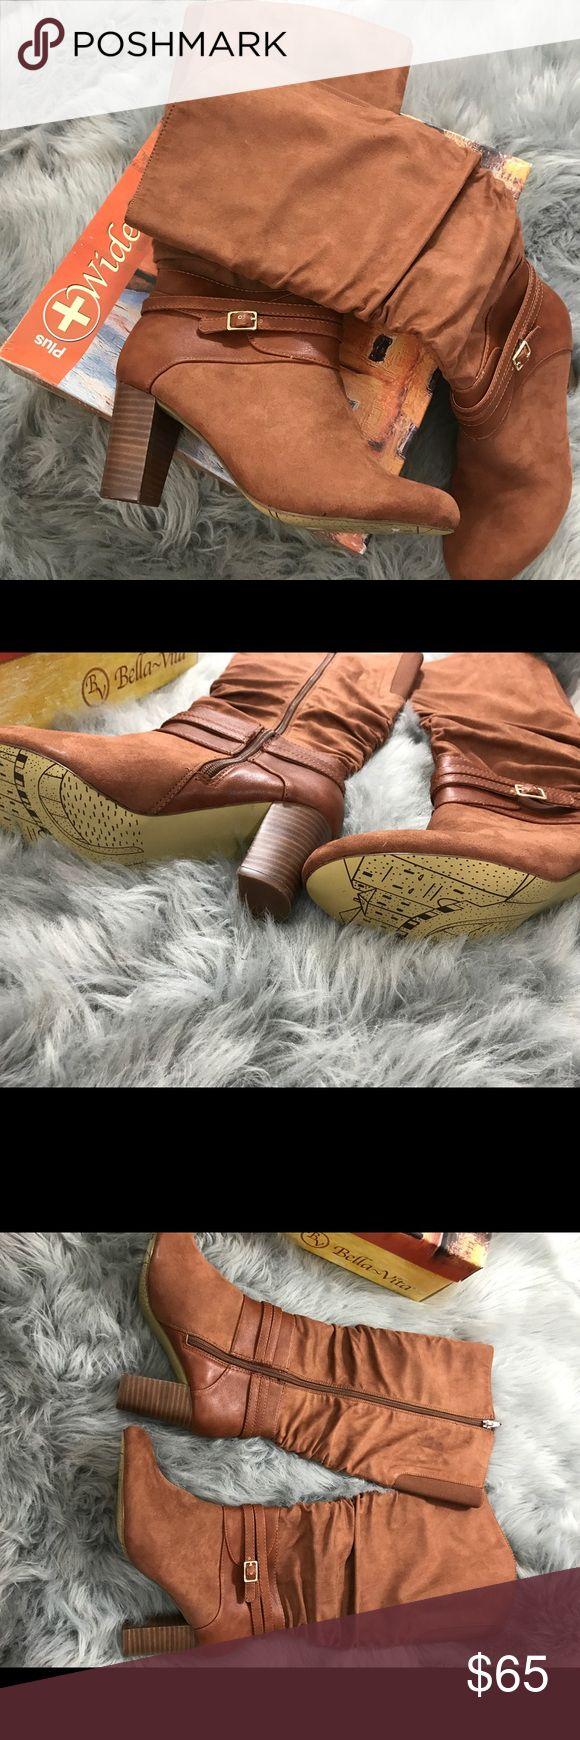 Bella Vita boot size 6.5 Brand new, including the box. Size 6.5, Bella Vita boot. (Wide calf). Heel height of 3inches. bella Vita Shoes Heeled Boots